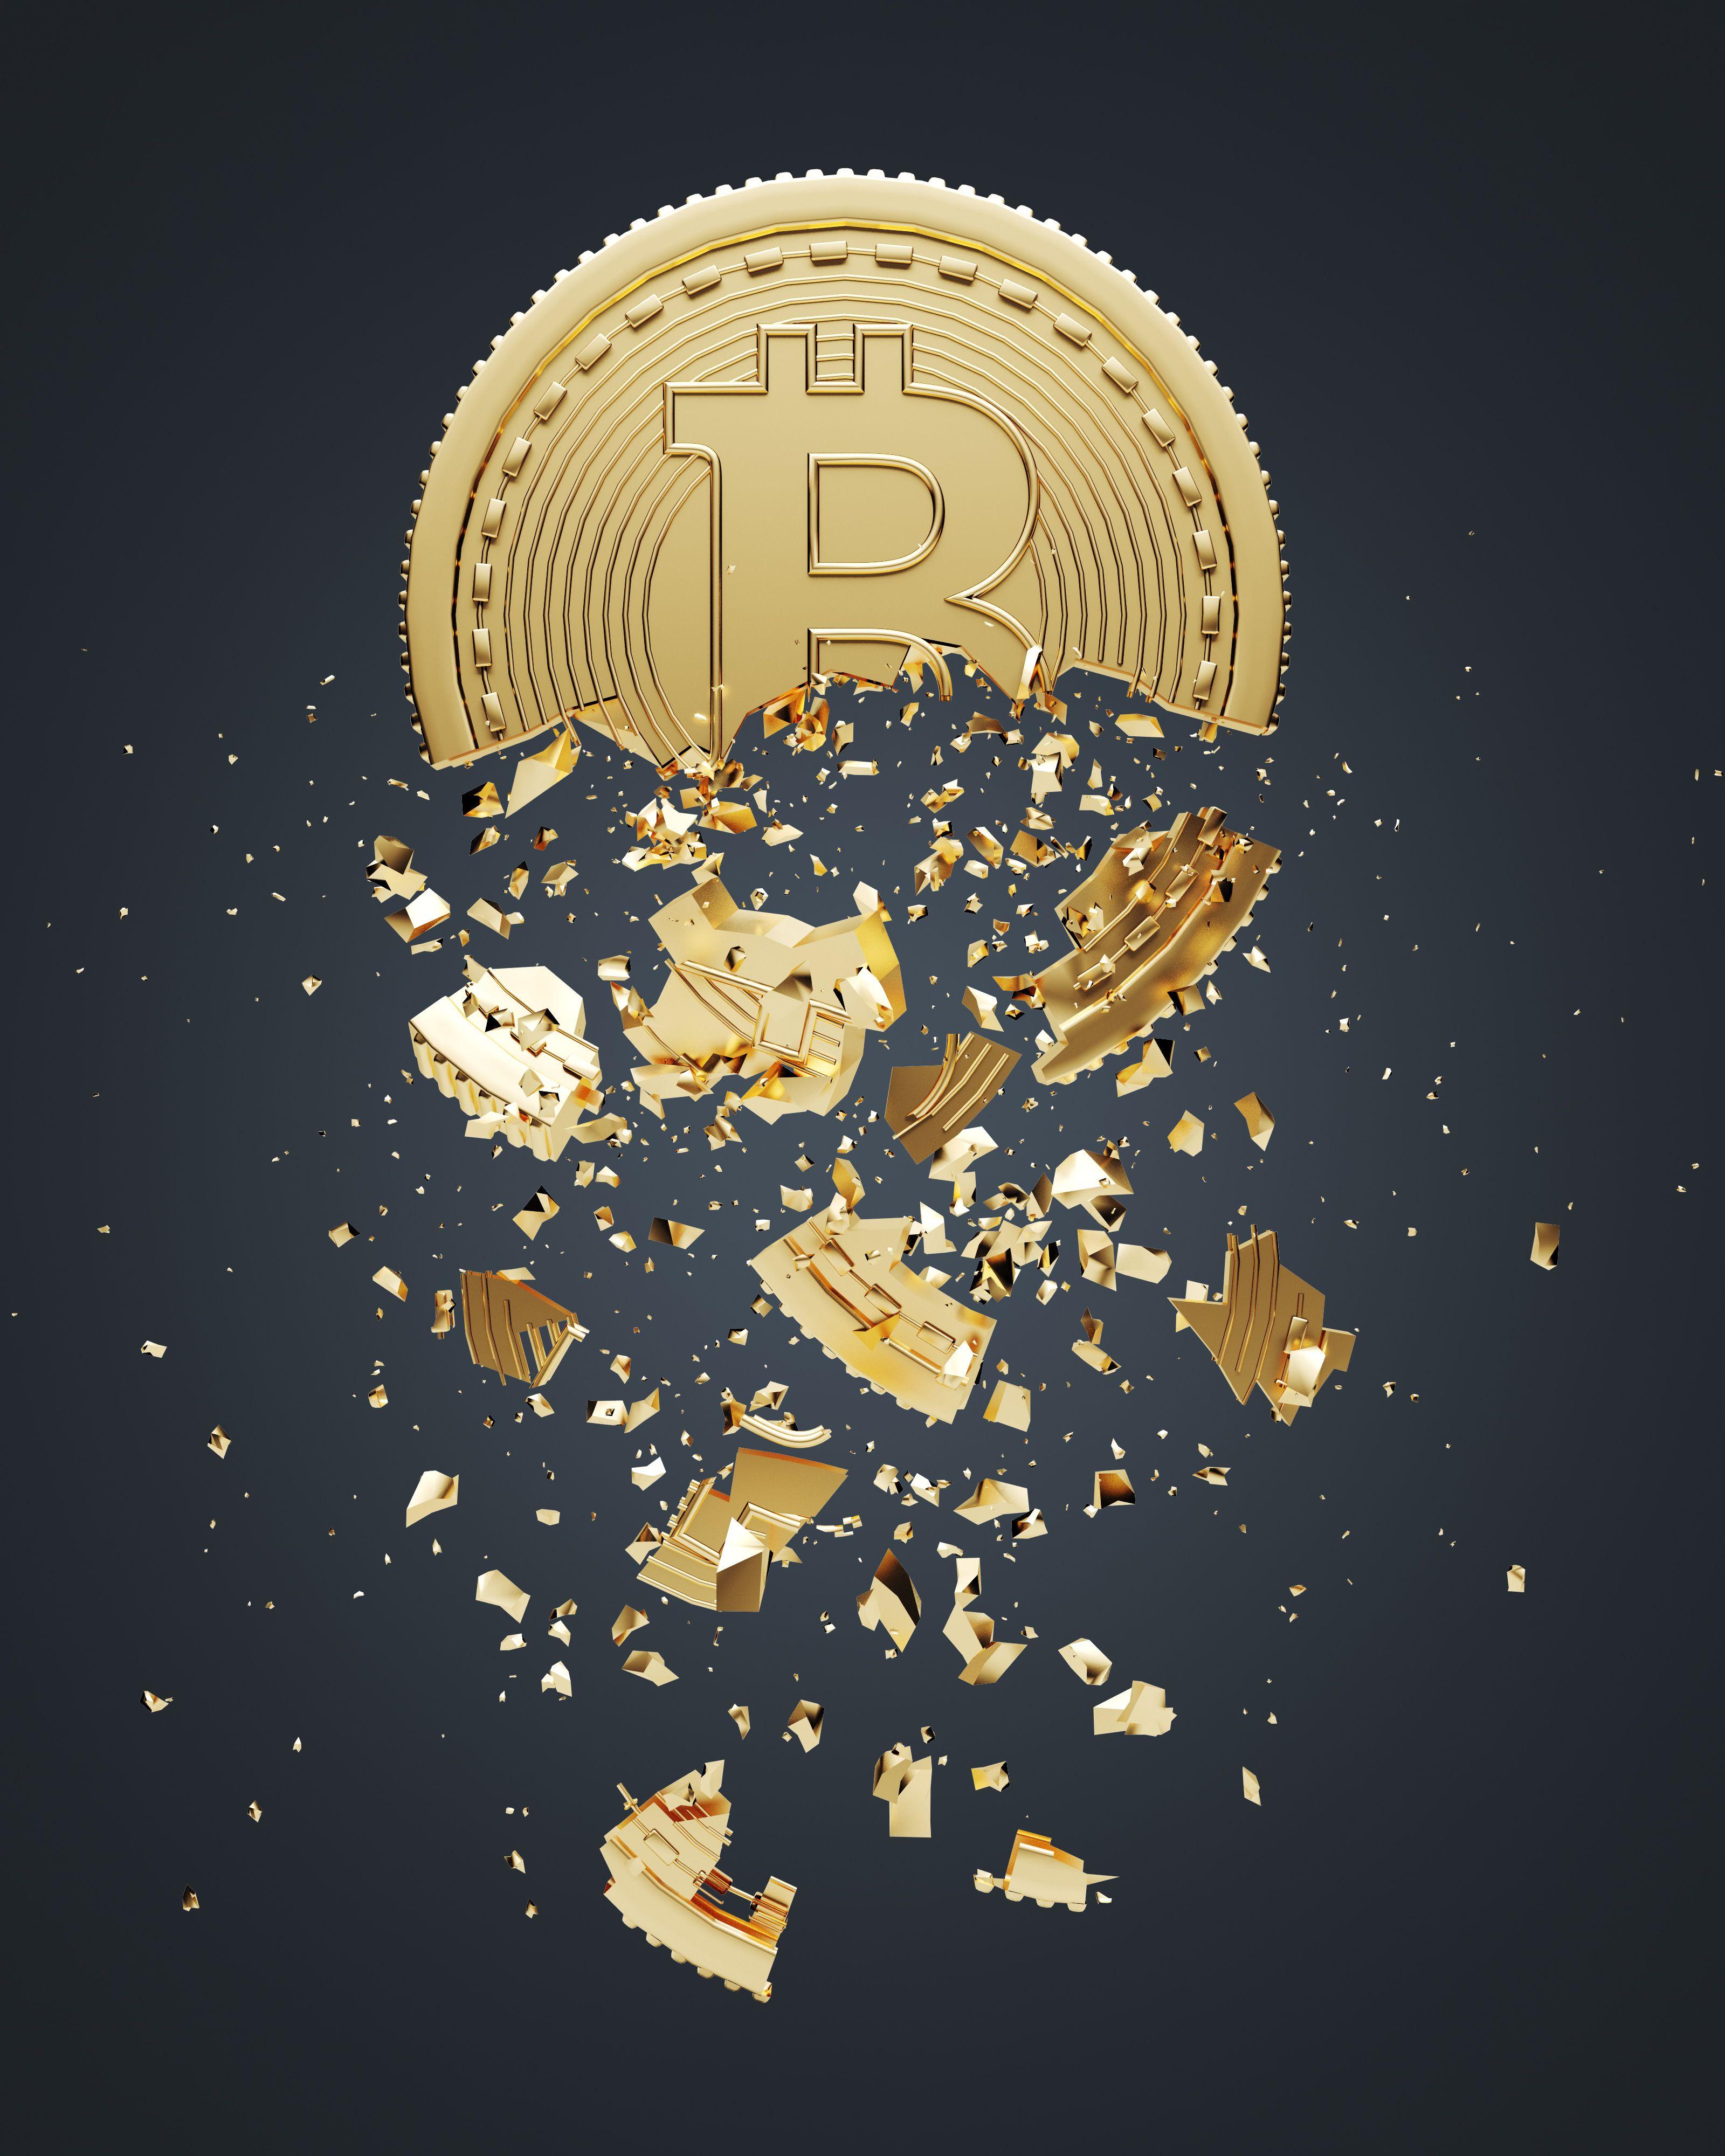 Bitcoin falls apart